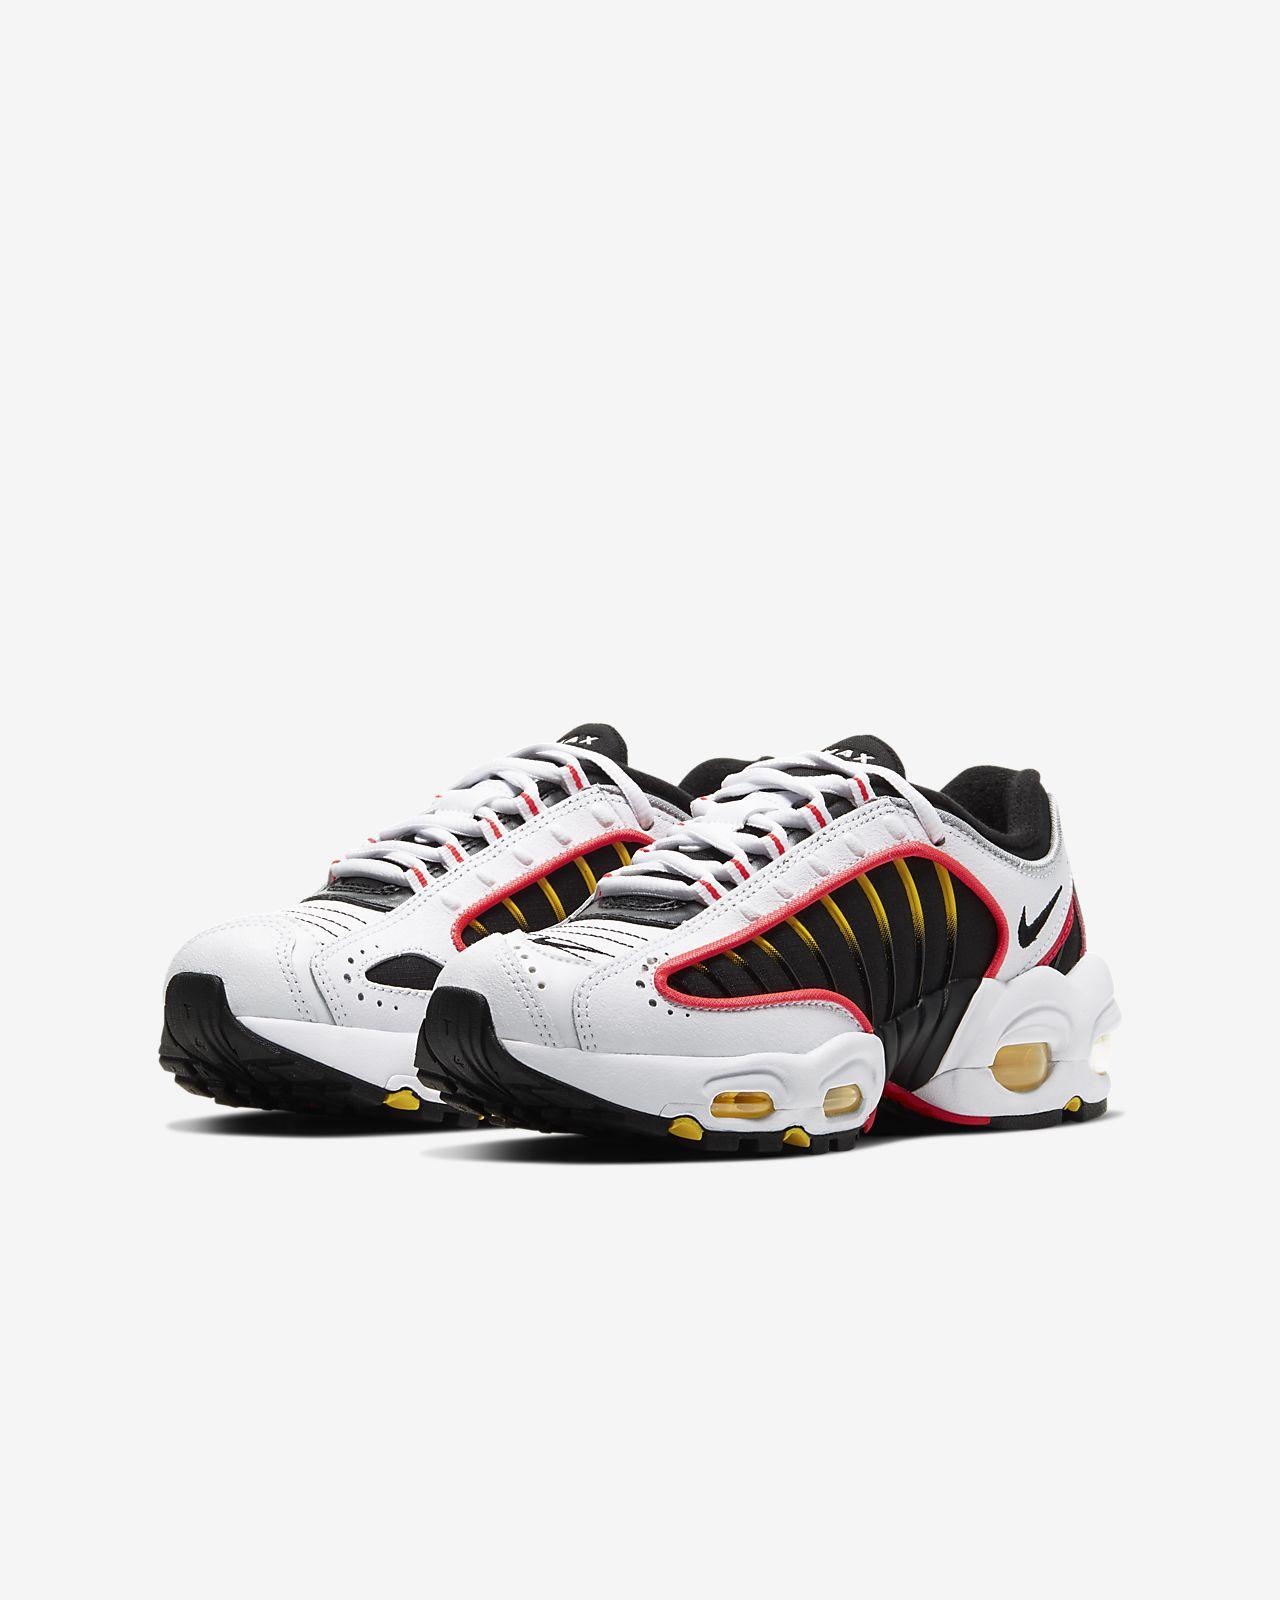 Nike Air Max Tailwind IV Older Kids' Shoe